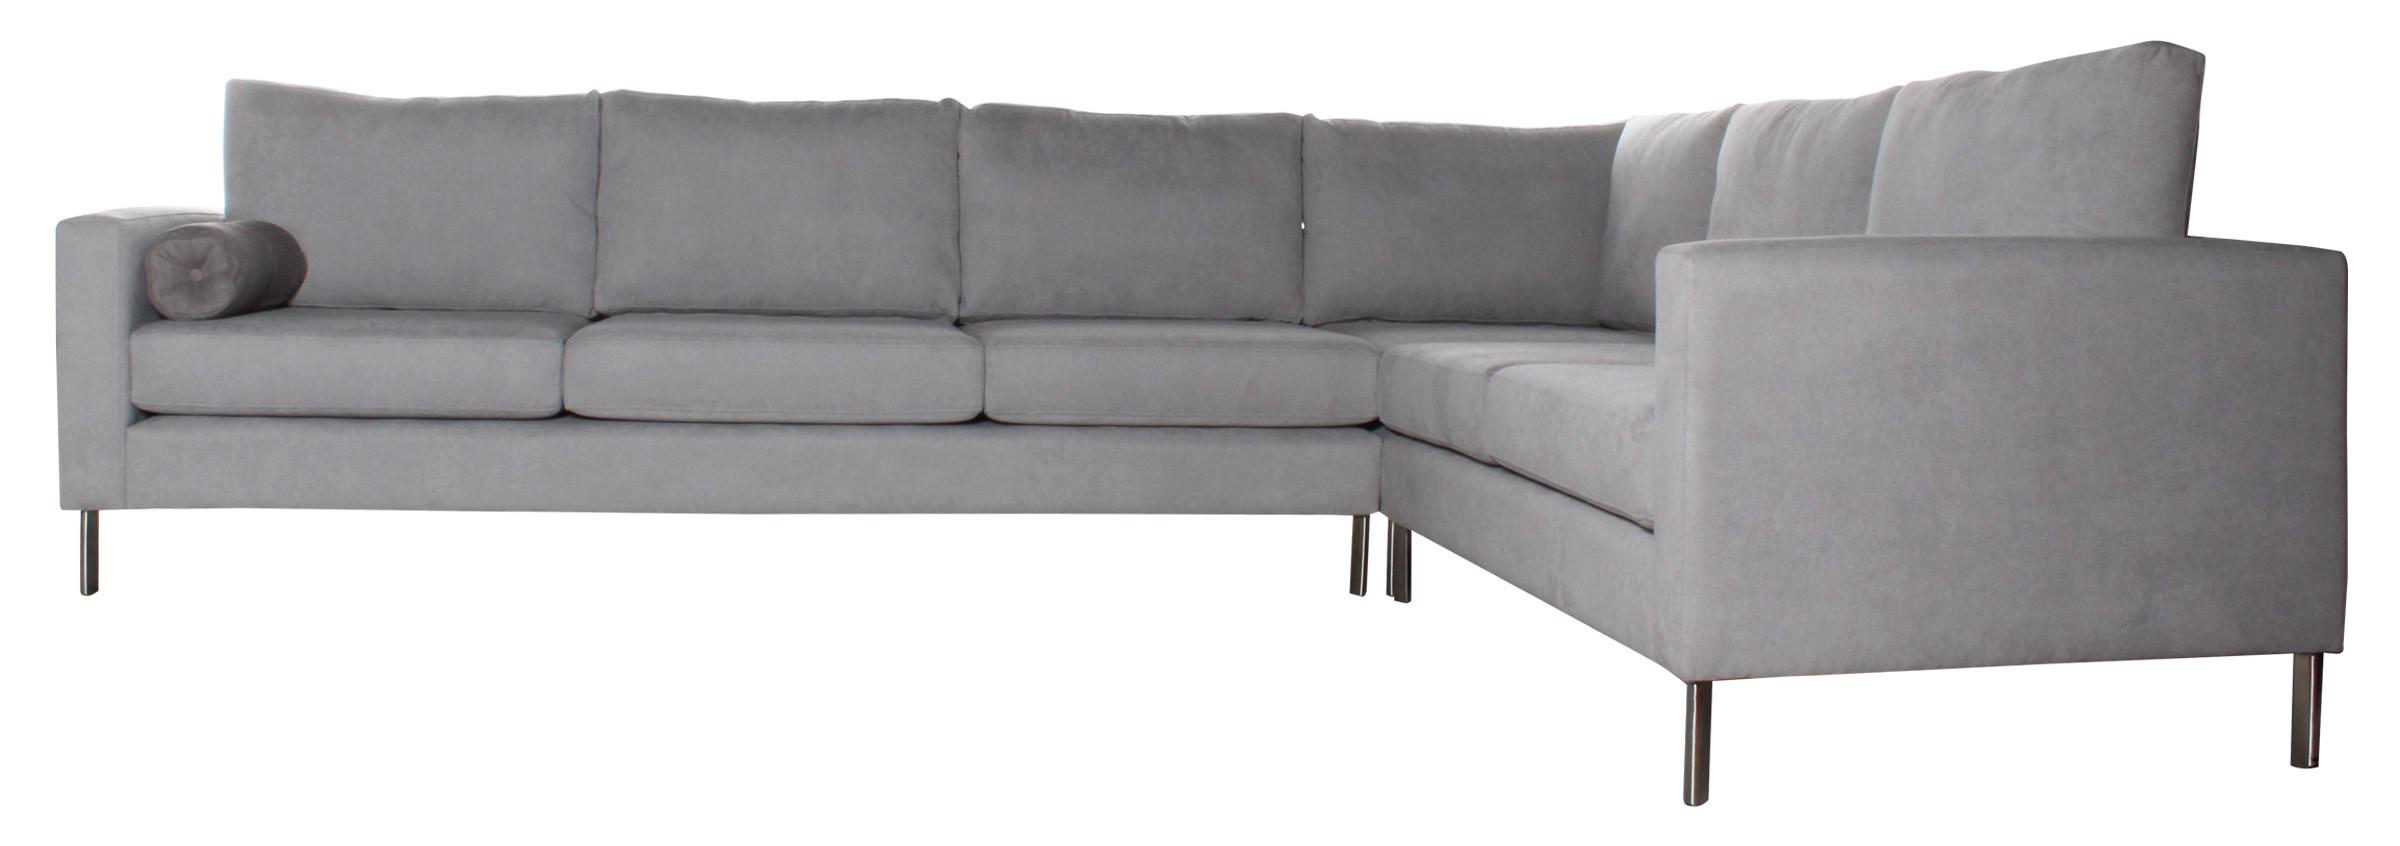 Sofa Modular Dresde Perla Cort